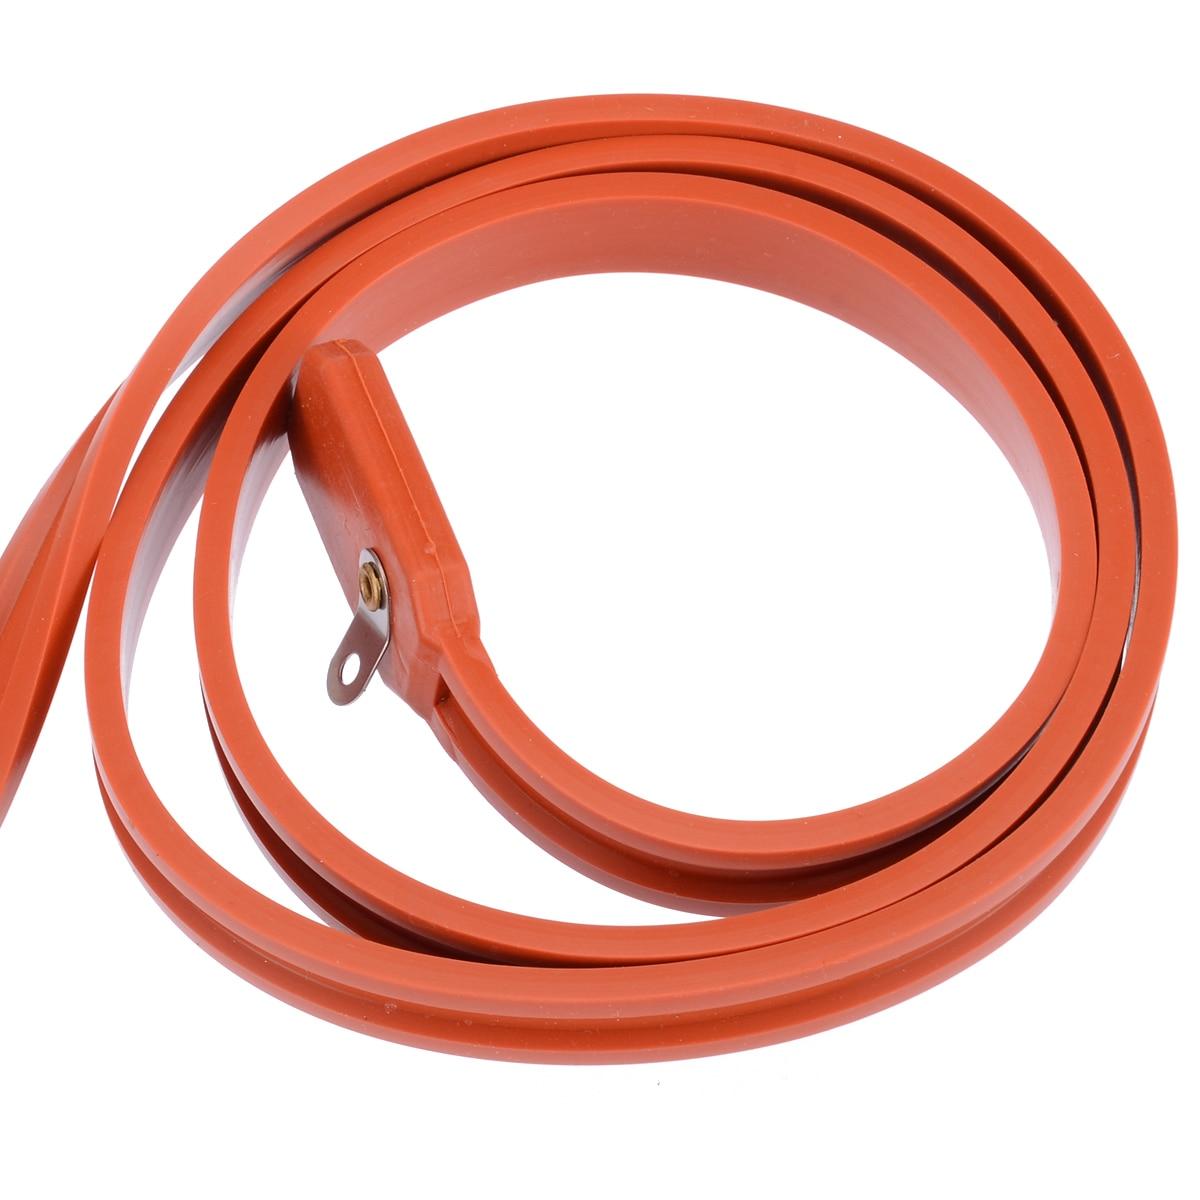 80W 220V Electric Brew Heating Belts Heater Brewing Belt for Wine Beer Spirit Fermentation Pail Making Accessory